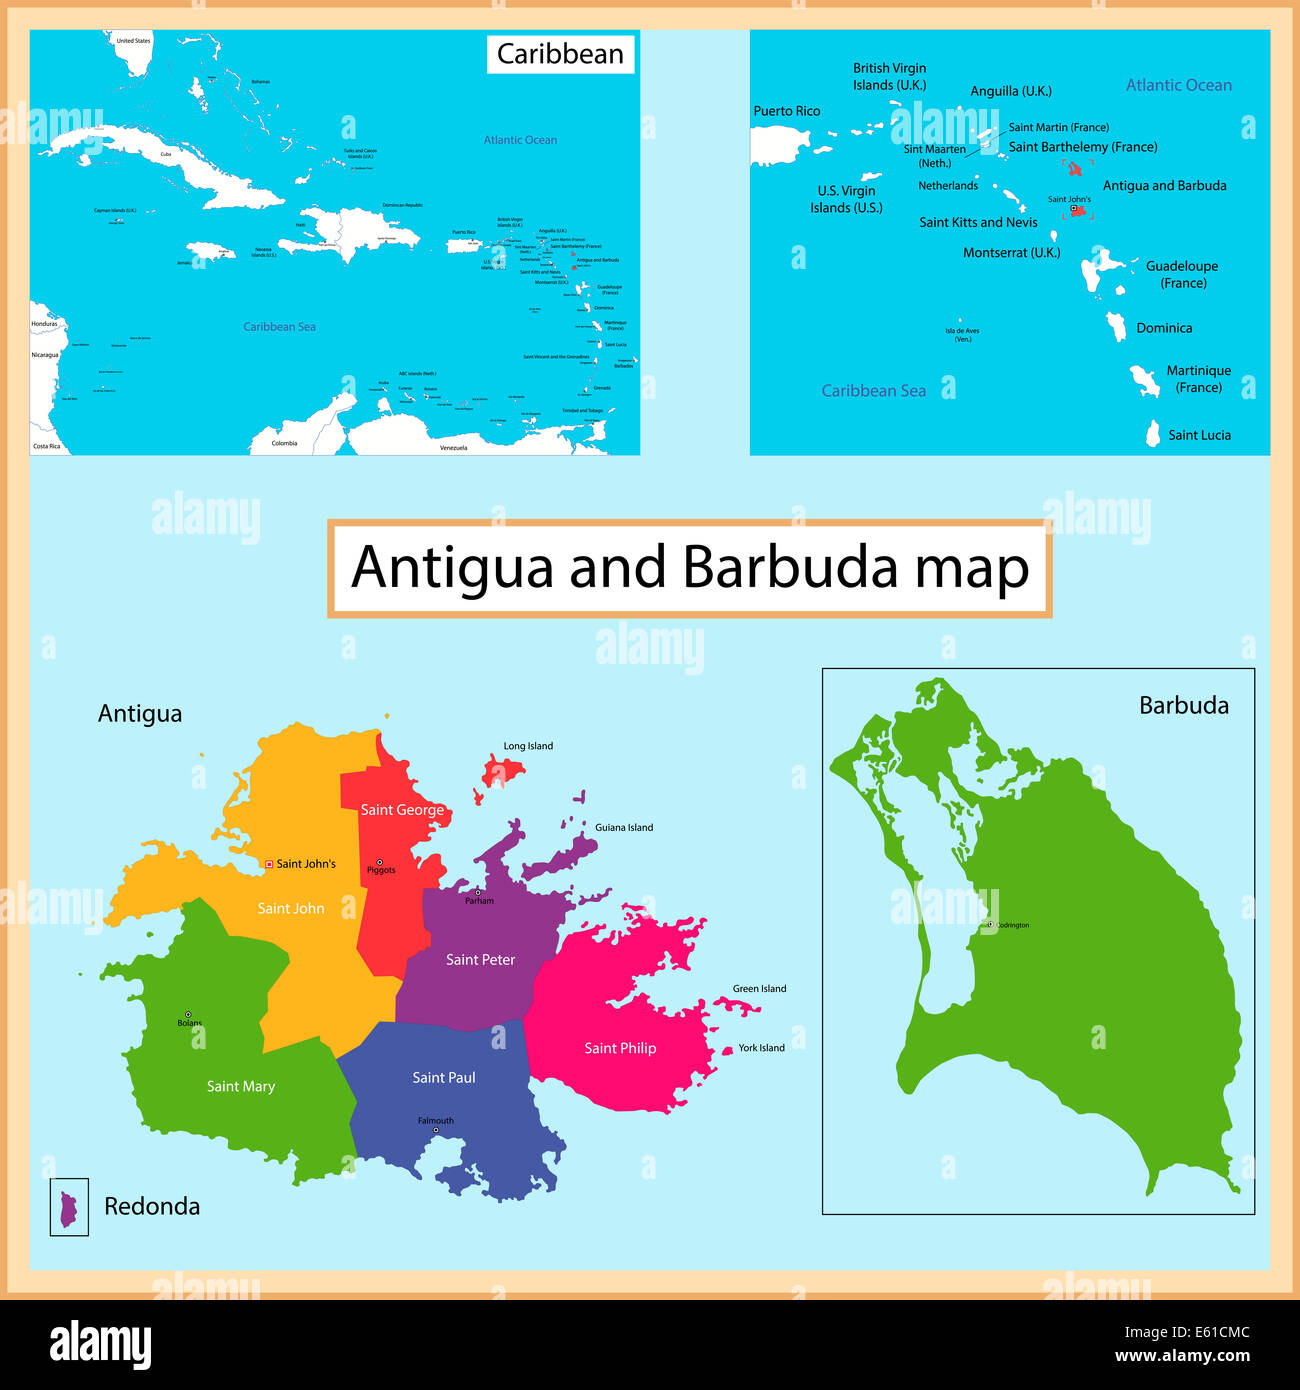 Antigua and Barbuda map Stock Photo: 72561340 - Alamy